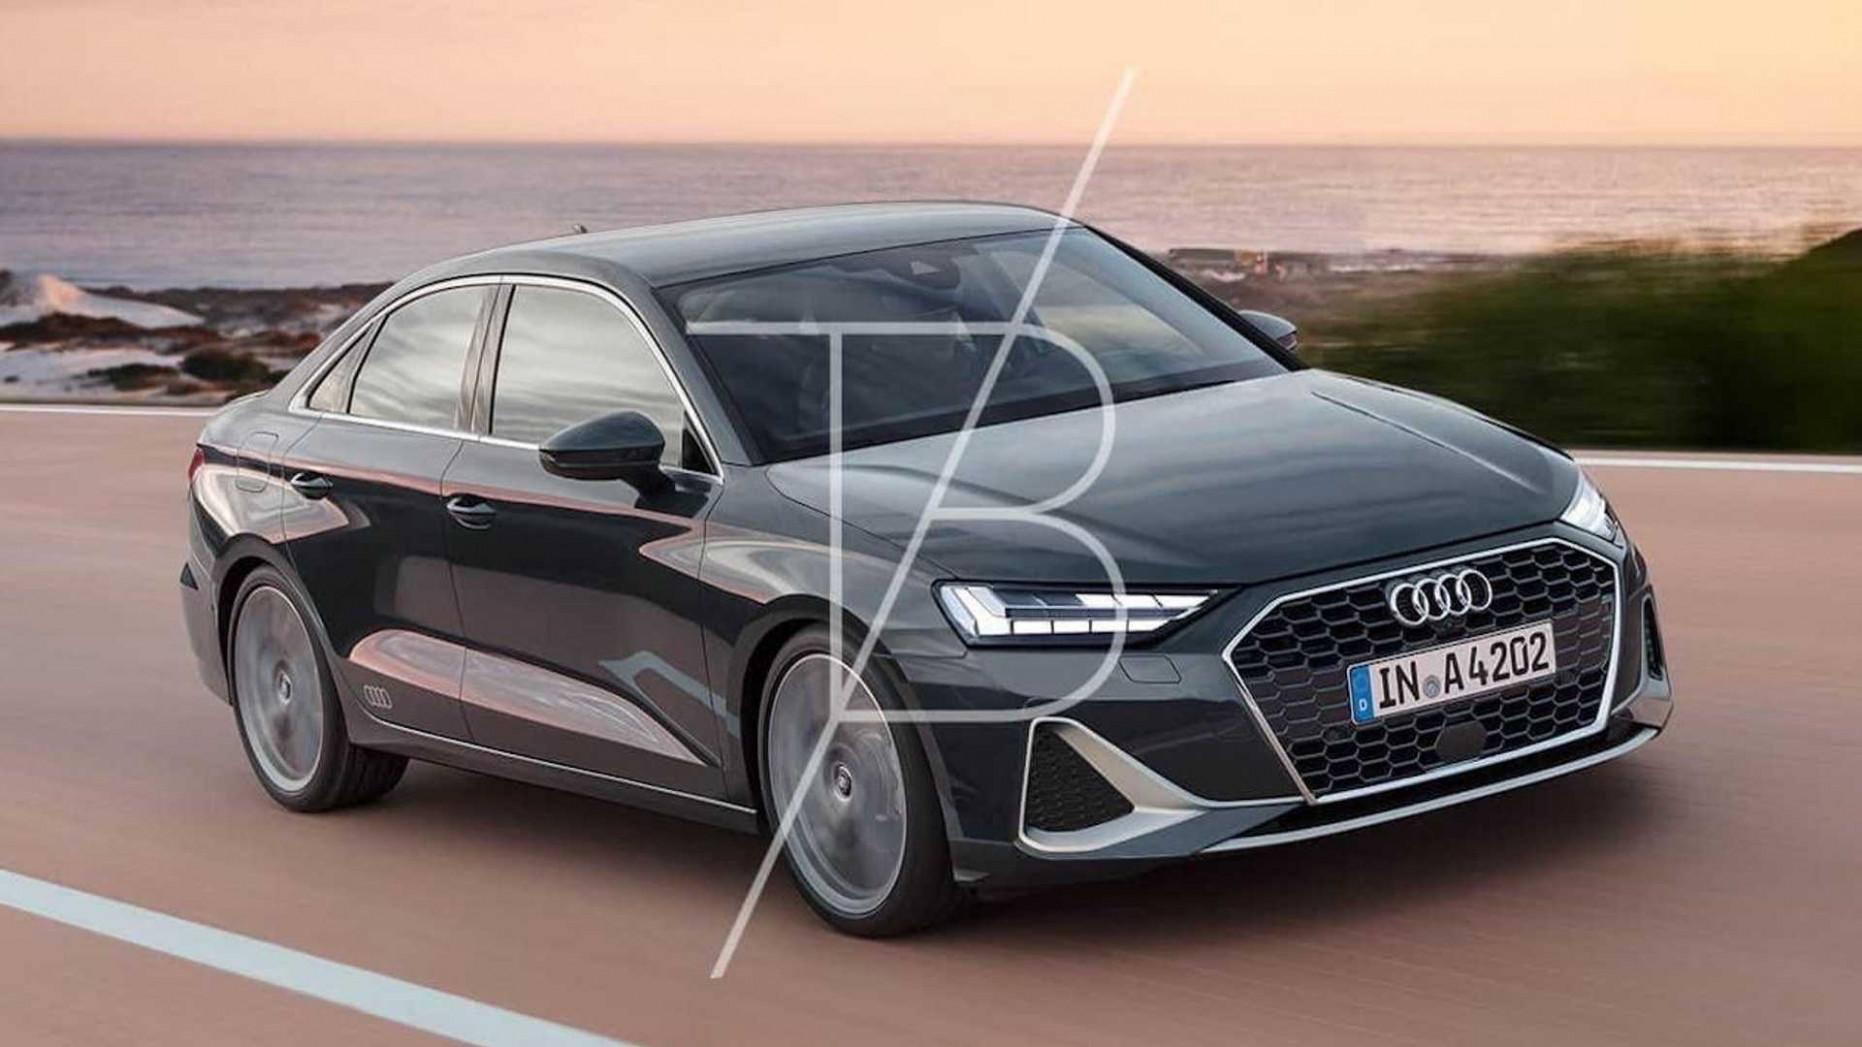 New Concept 2022 Audi S4